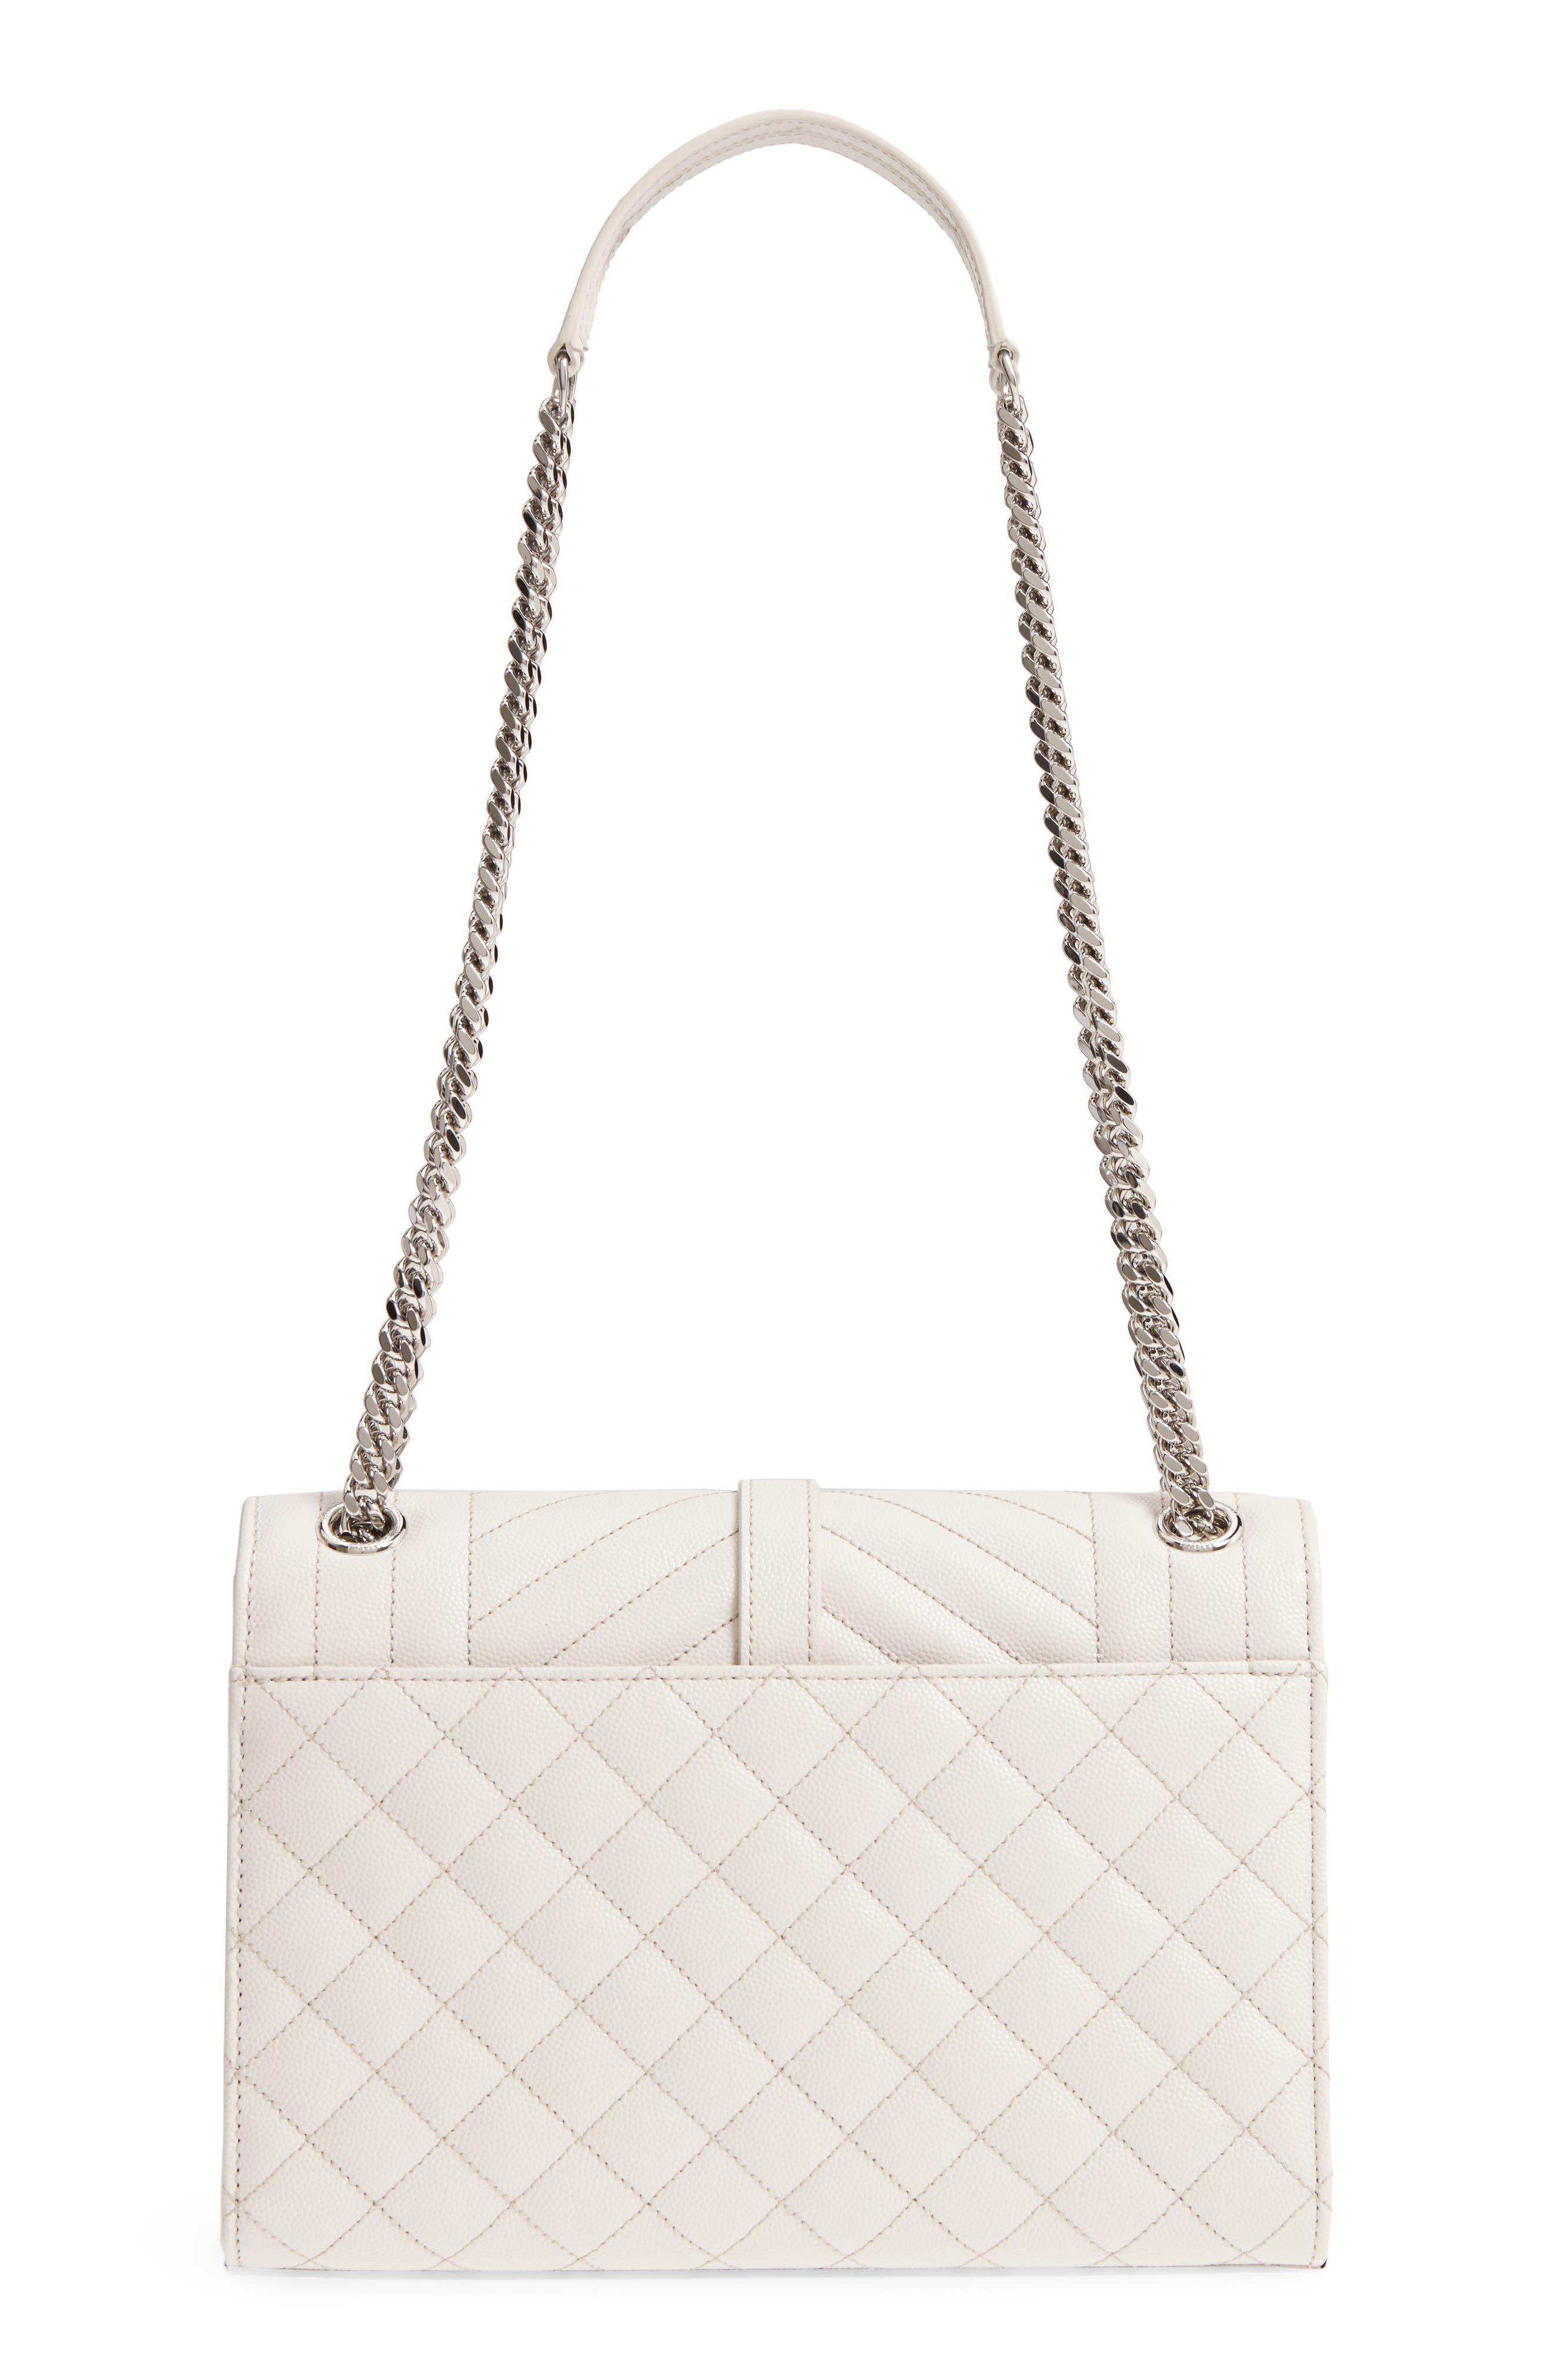 Medium Cassandra Calfskin Shoulder Bag,                             Alternate thumbnail 3, color,                             ICY WHITE/ ICY WHITE